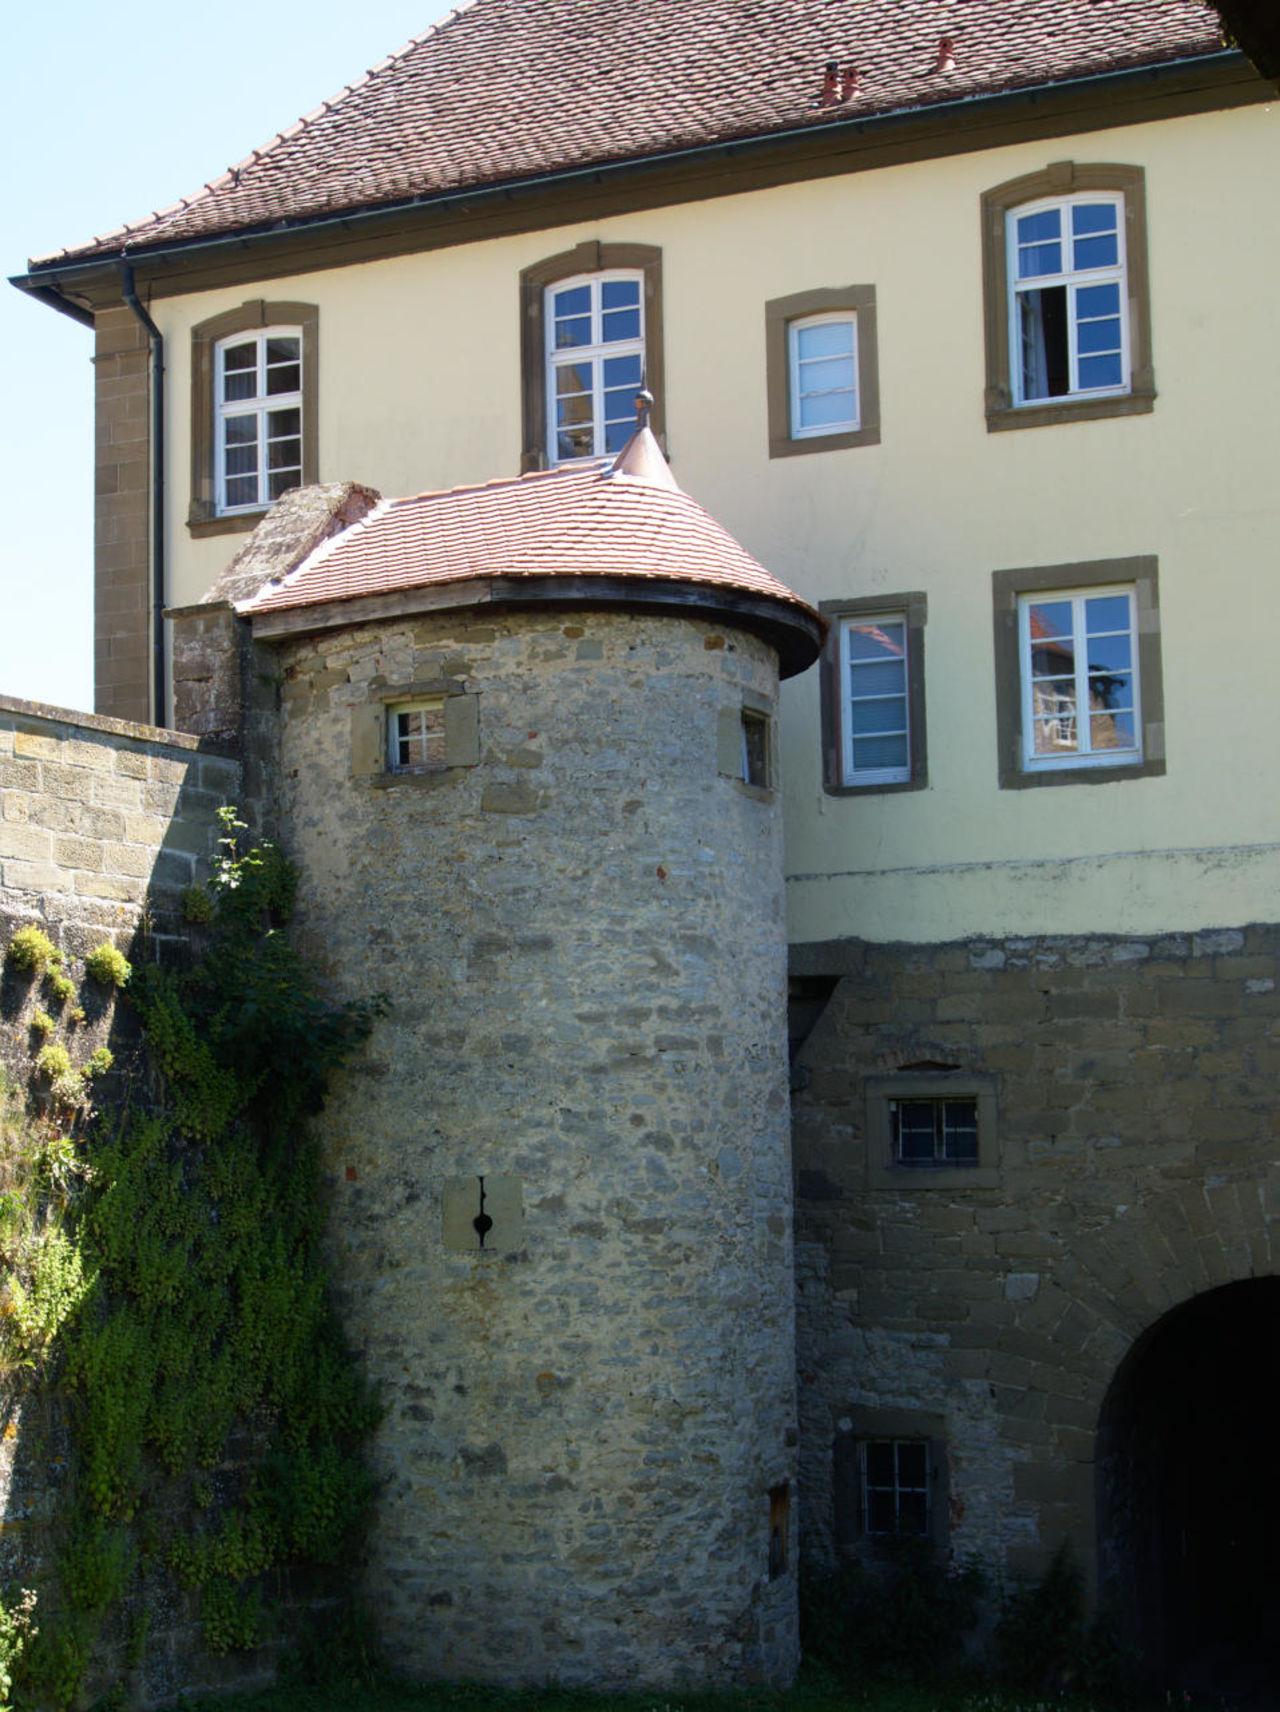 20190628_Kloster_Comburg_013